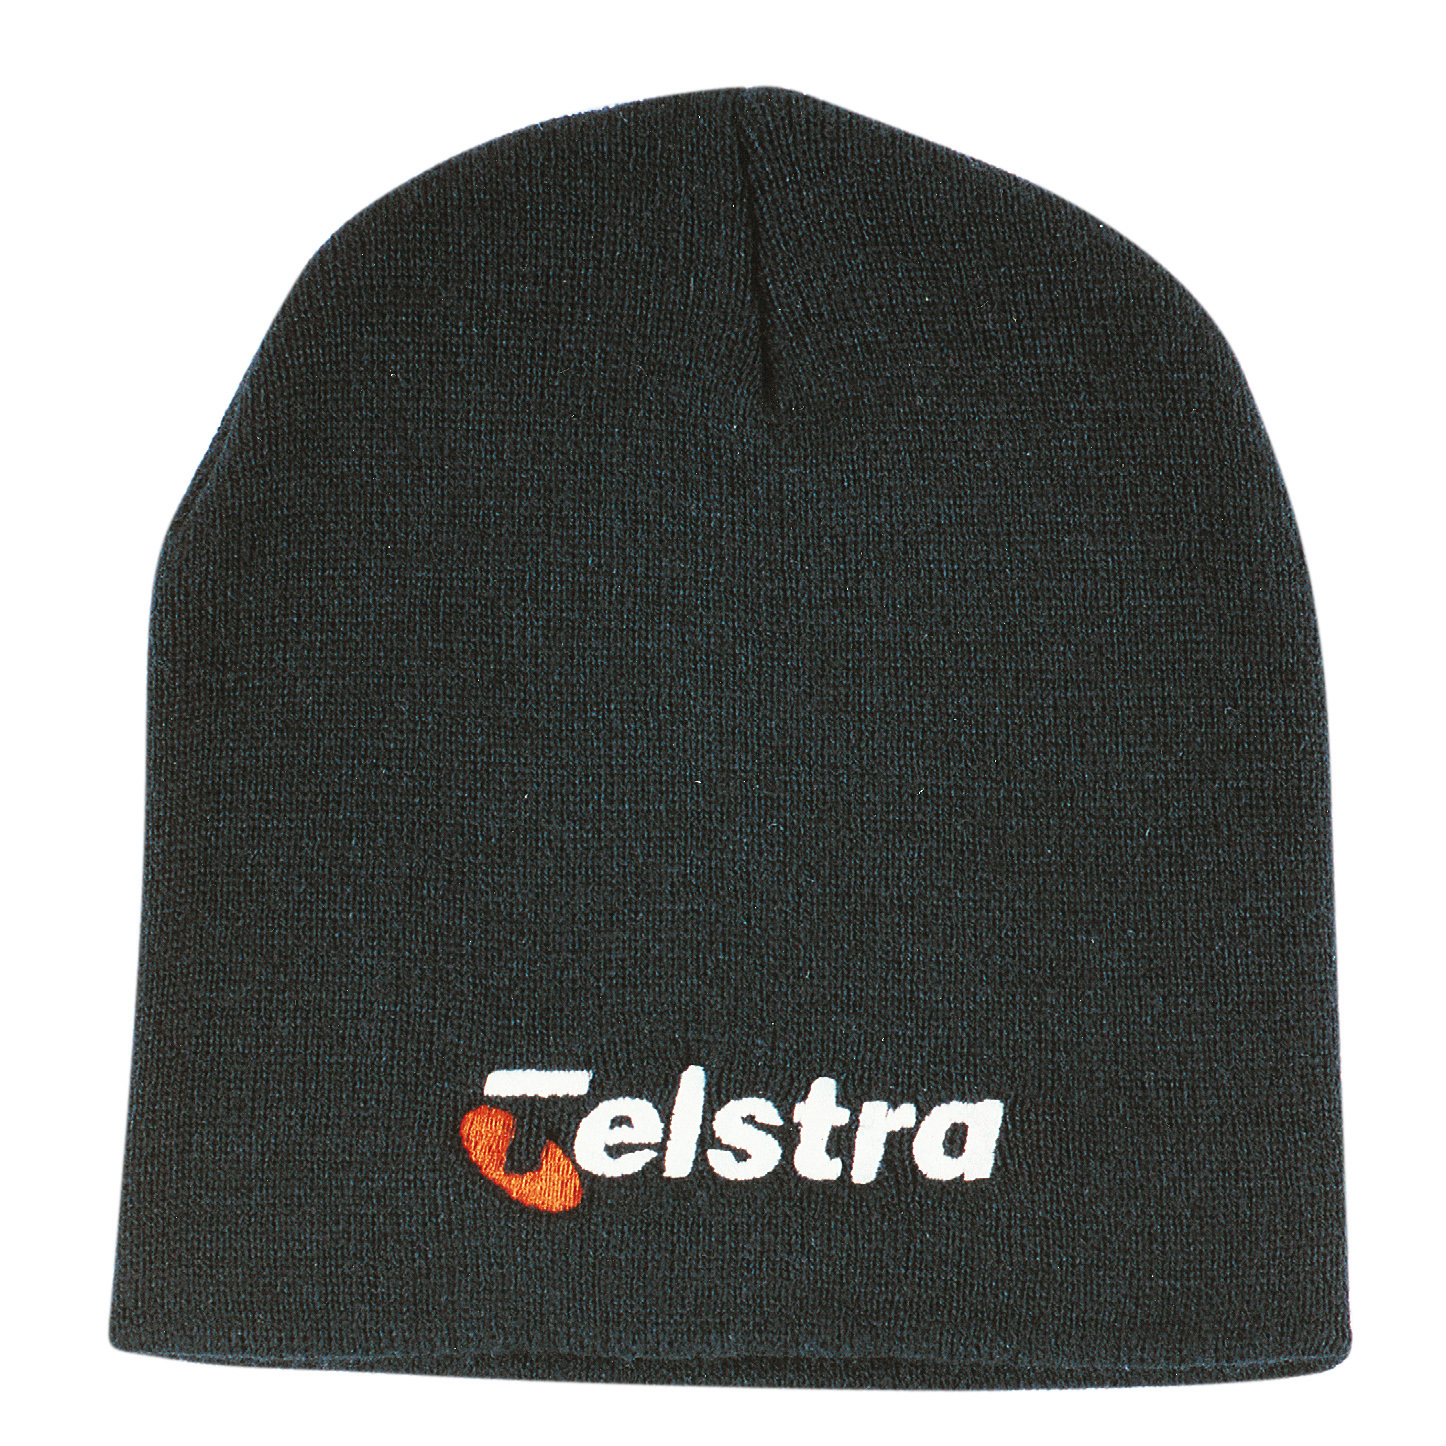 4244 Telstra Beanie